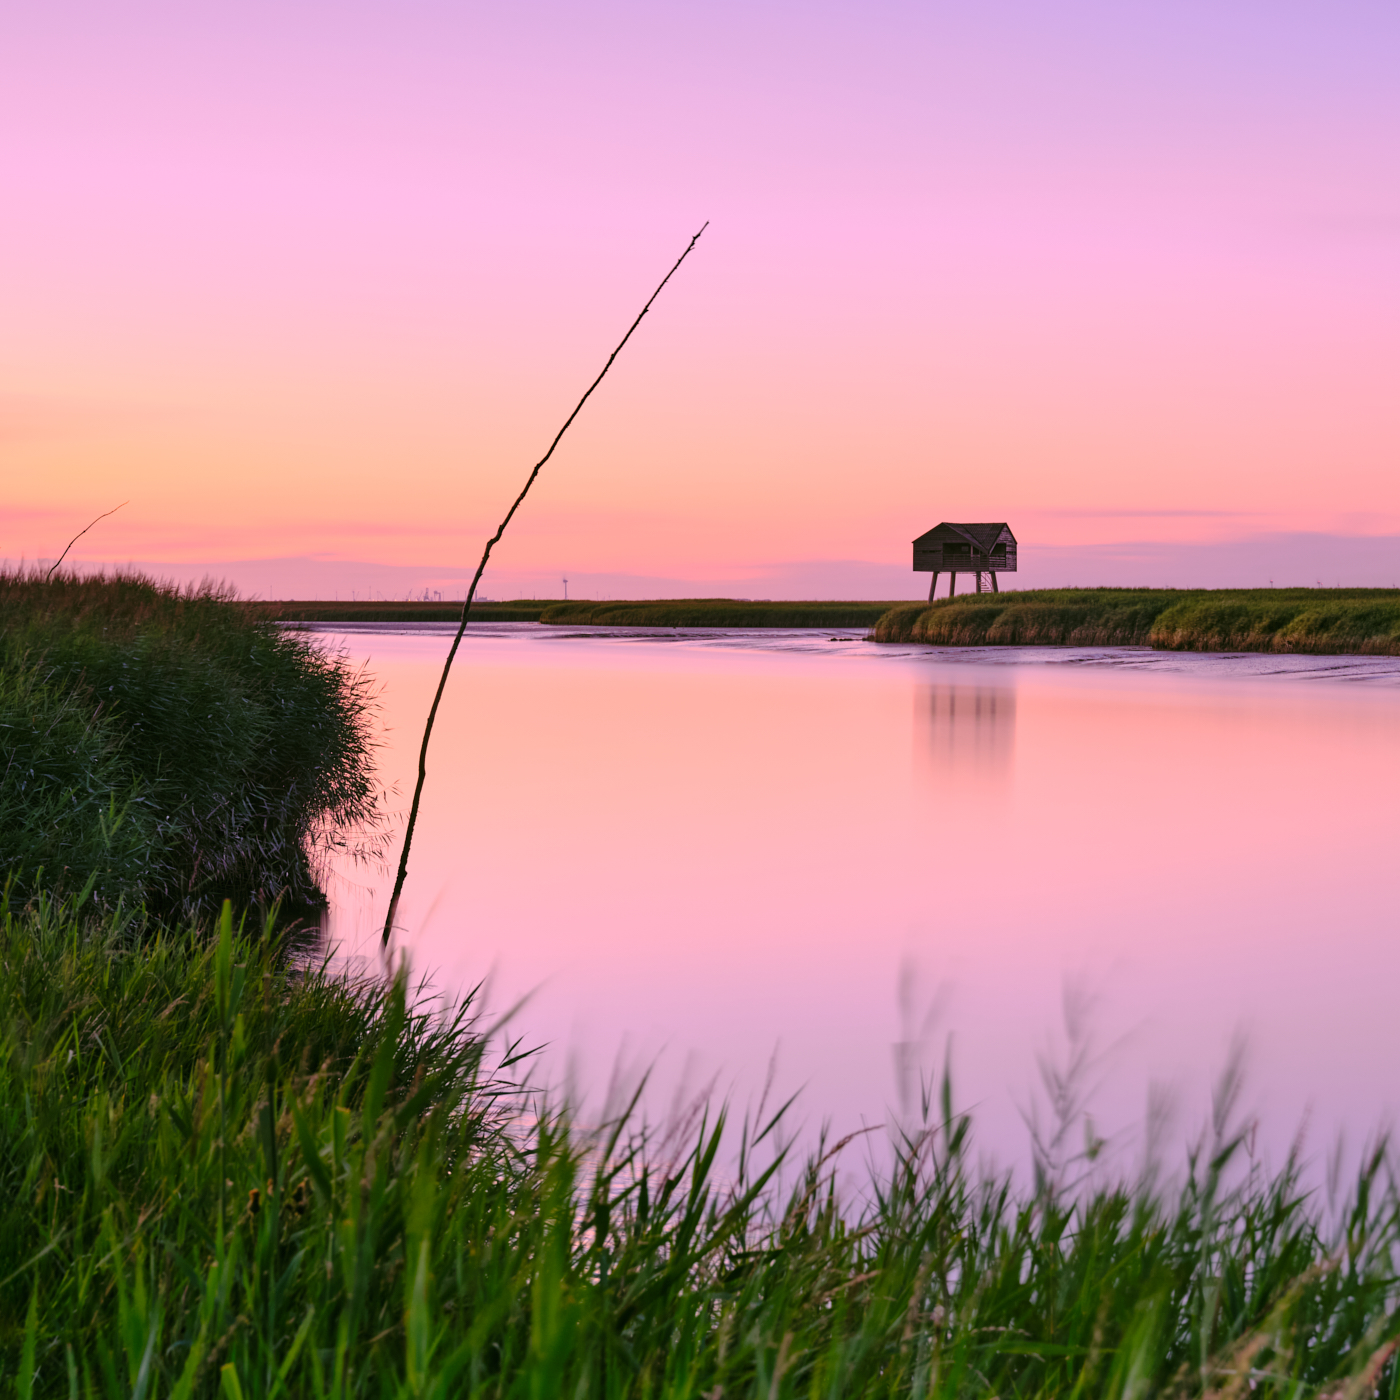 Kiekkaaste | Landschapsfotograaf Harmen Piekema